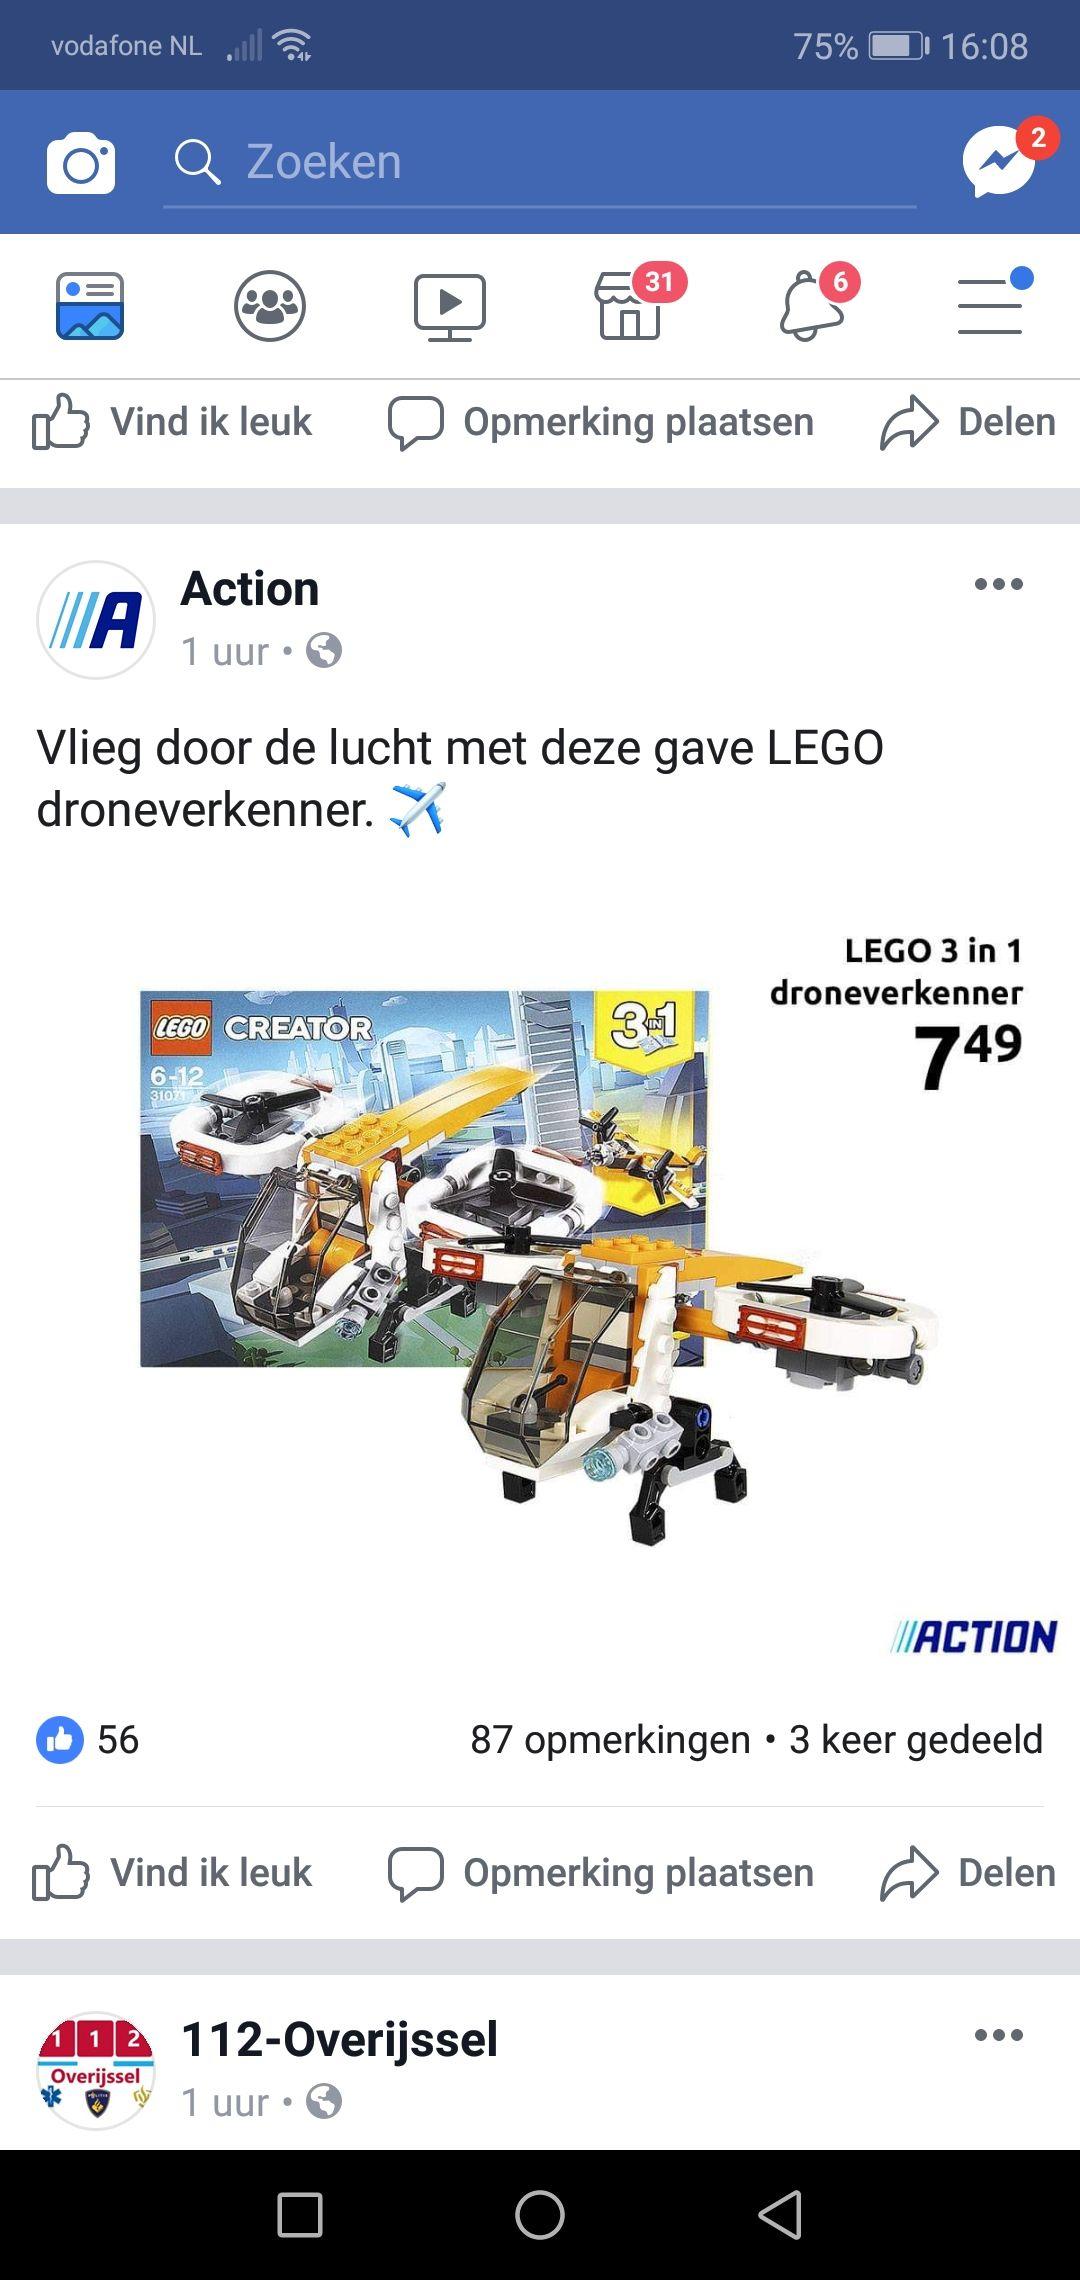 Lego drone verkenner. Action